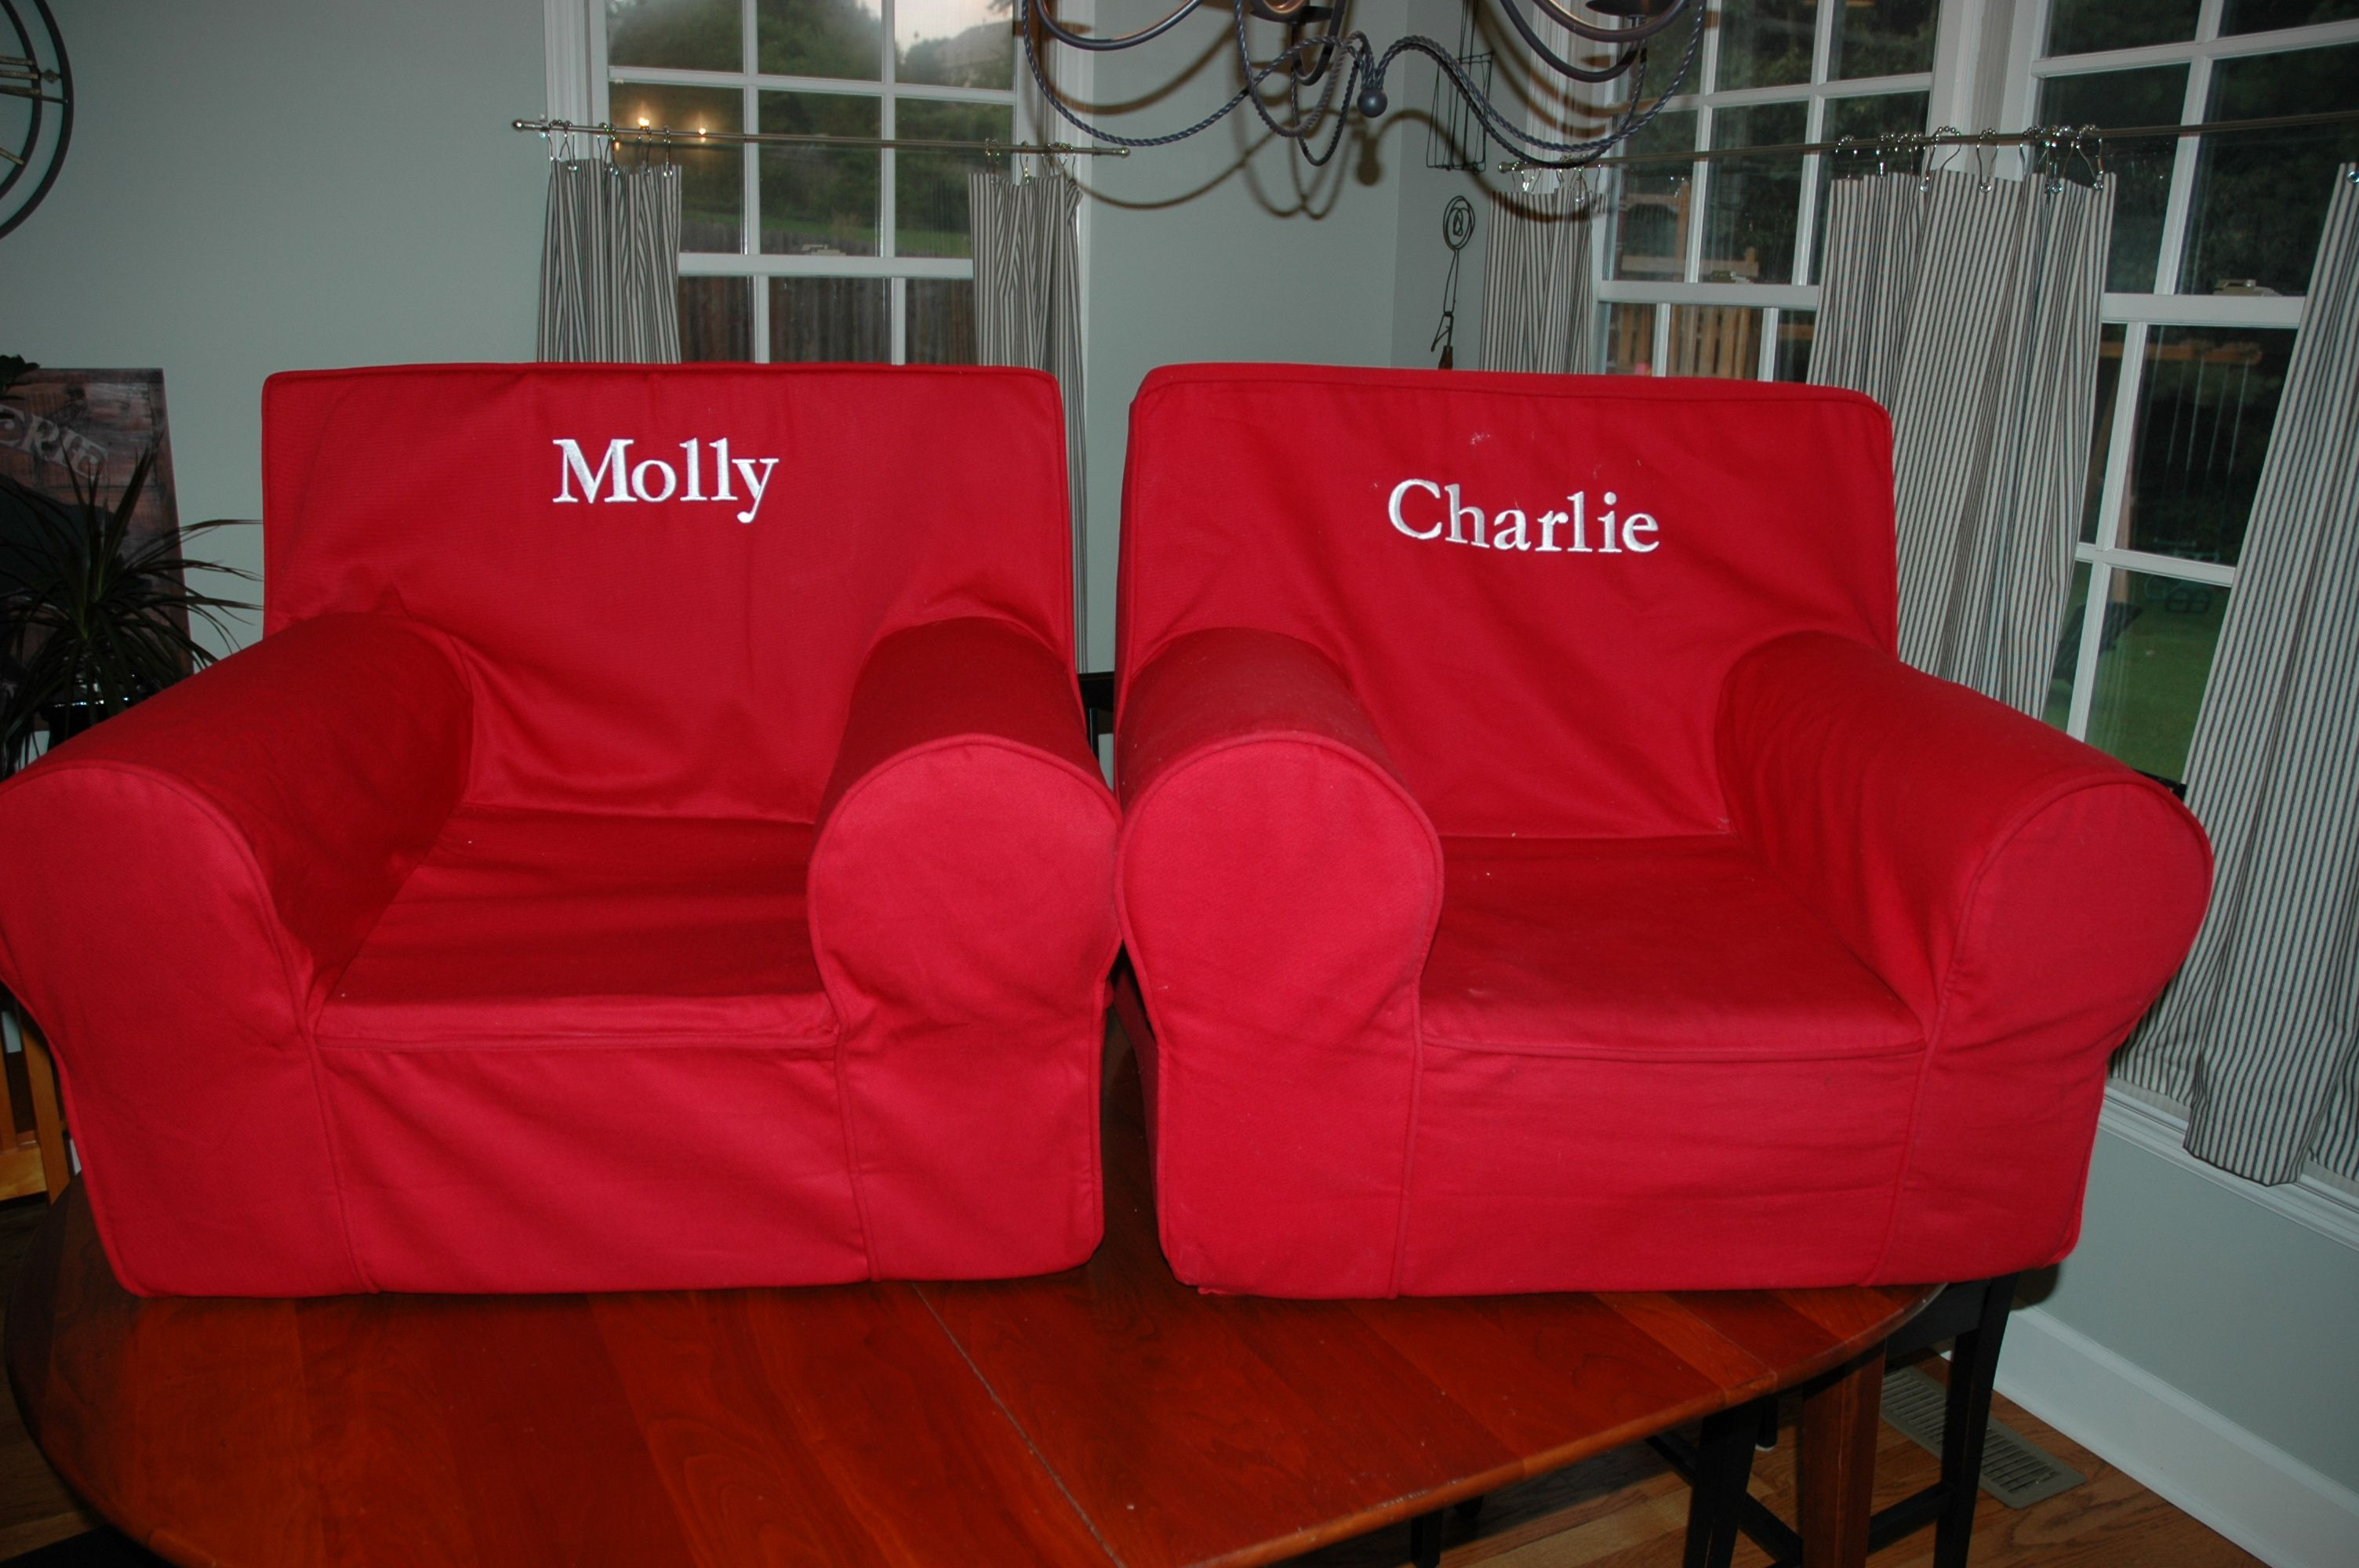 How I Saved 54 On A Pottery Barn Anywhere Chair Diy Kids Chair